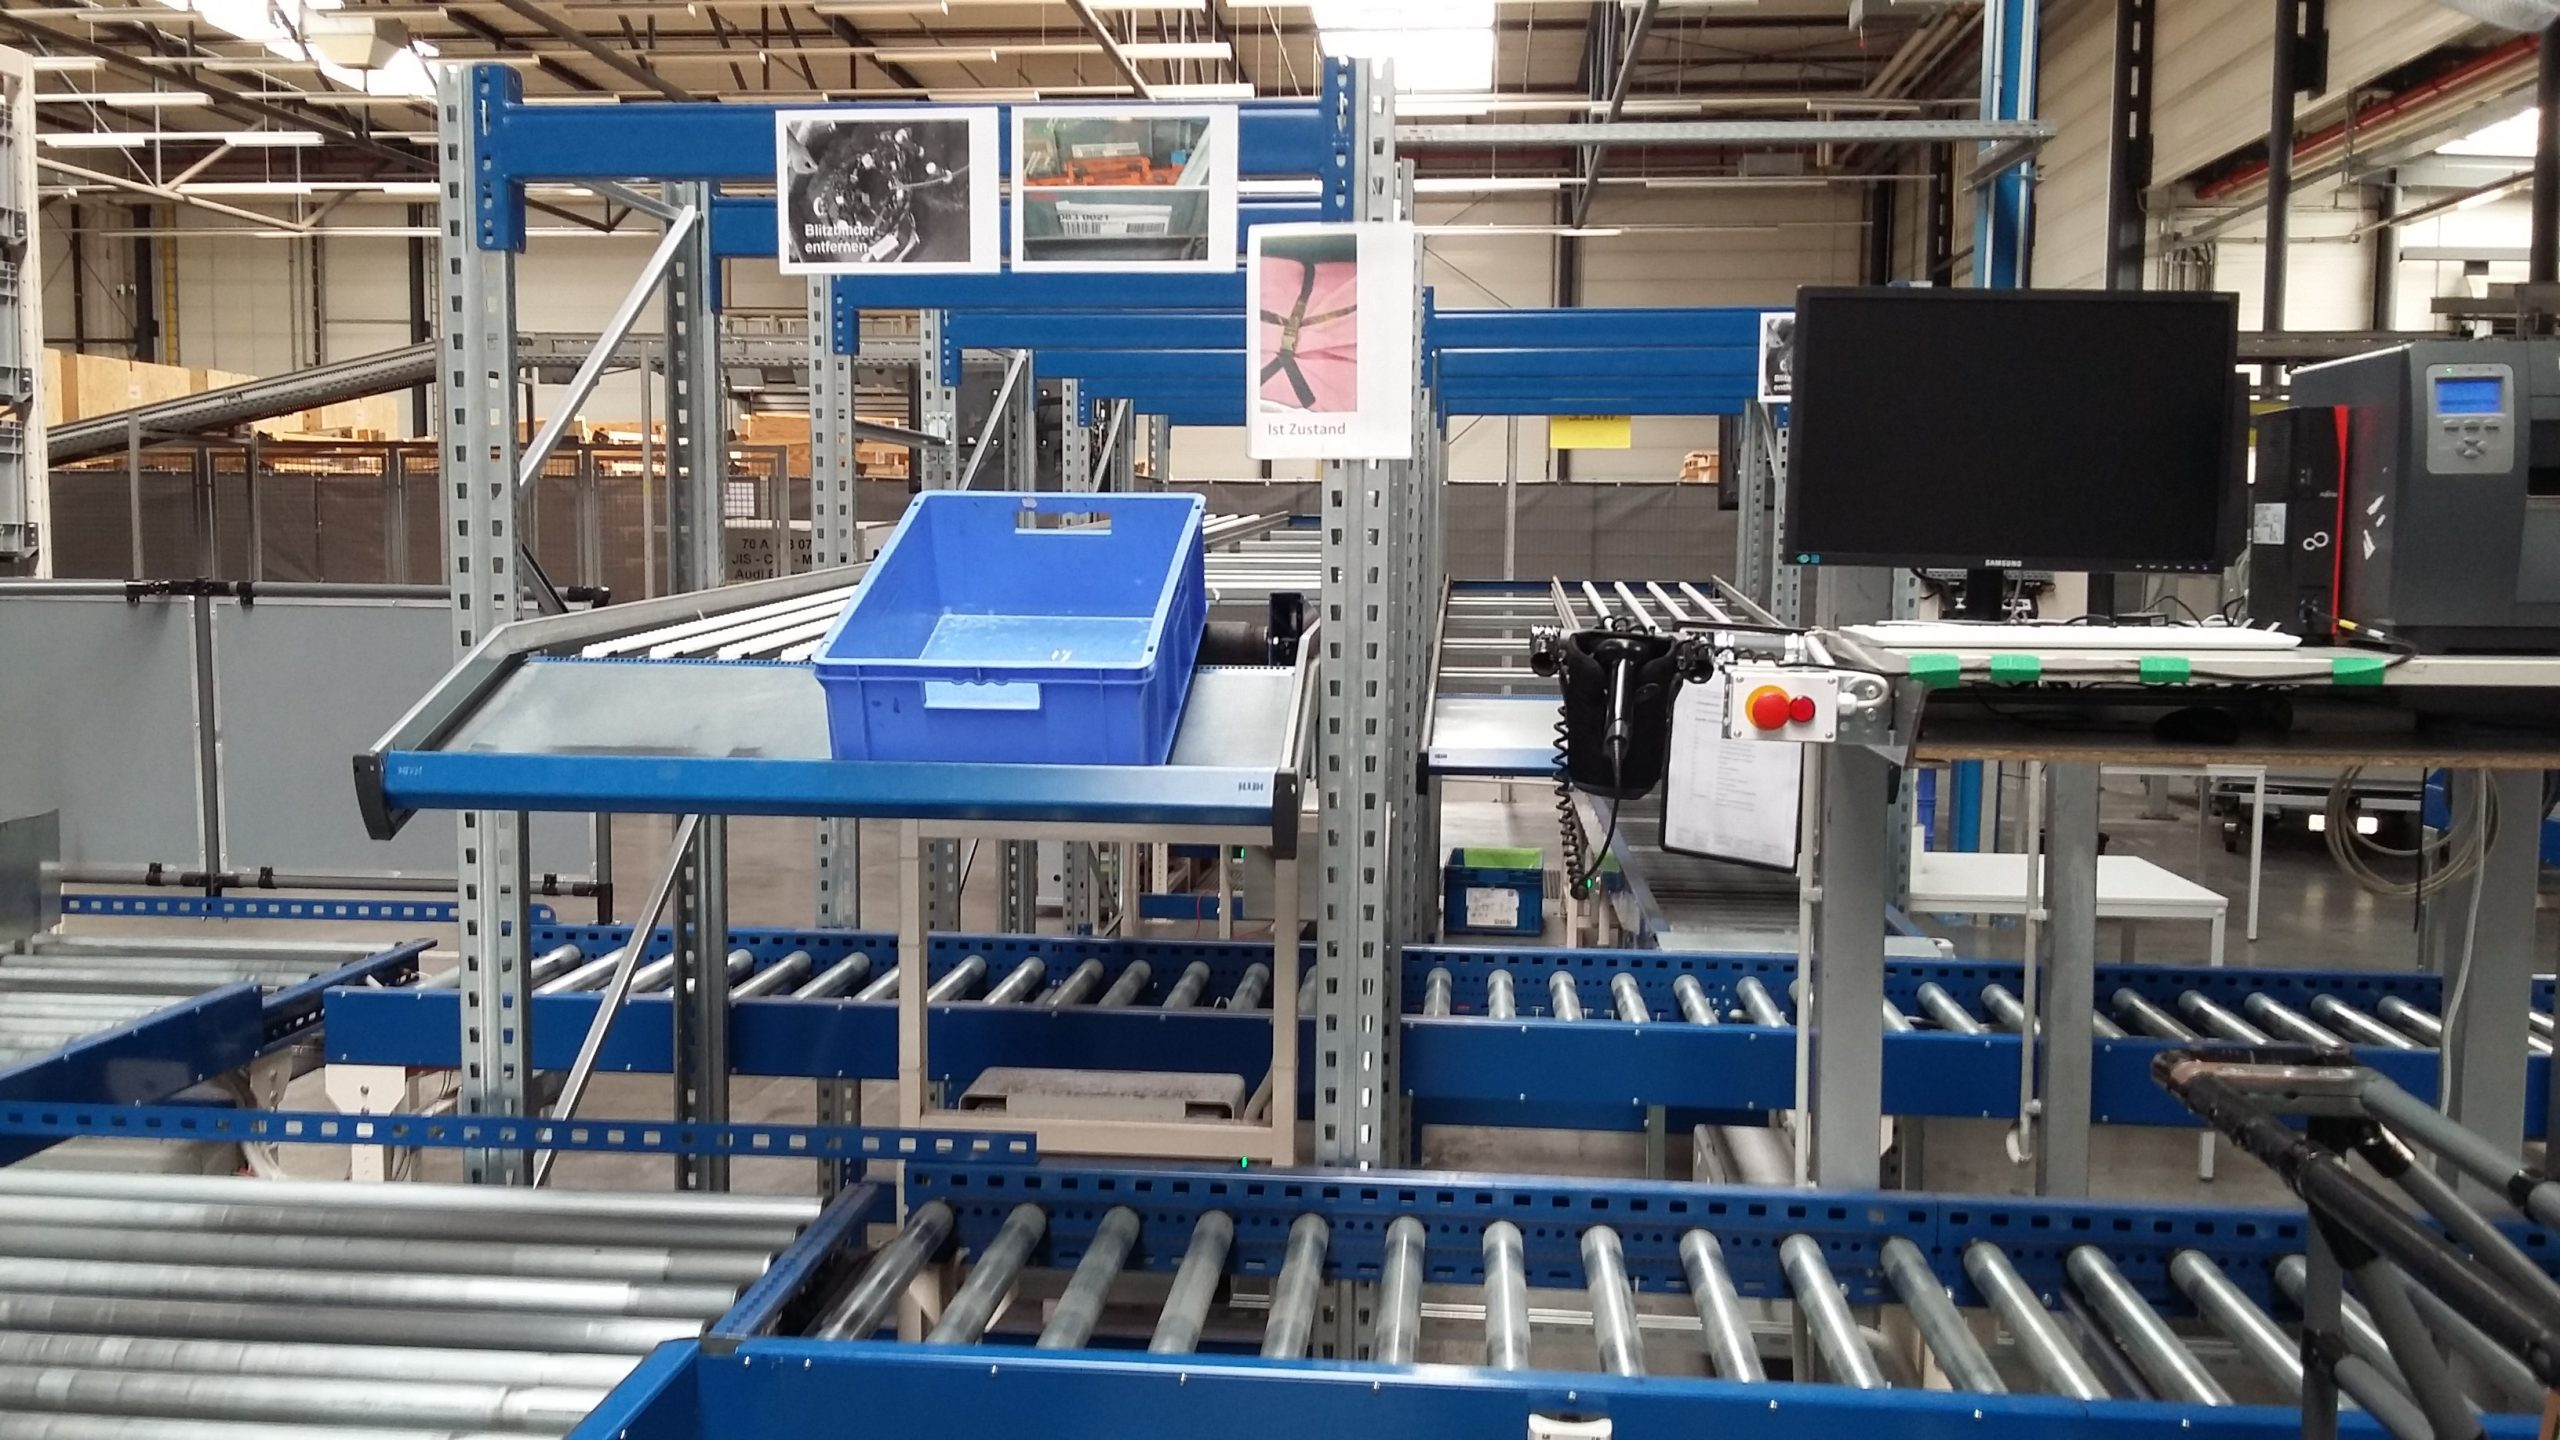 Production warehouse automation for Kromberg&Schubert - 8 - kapelou.com